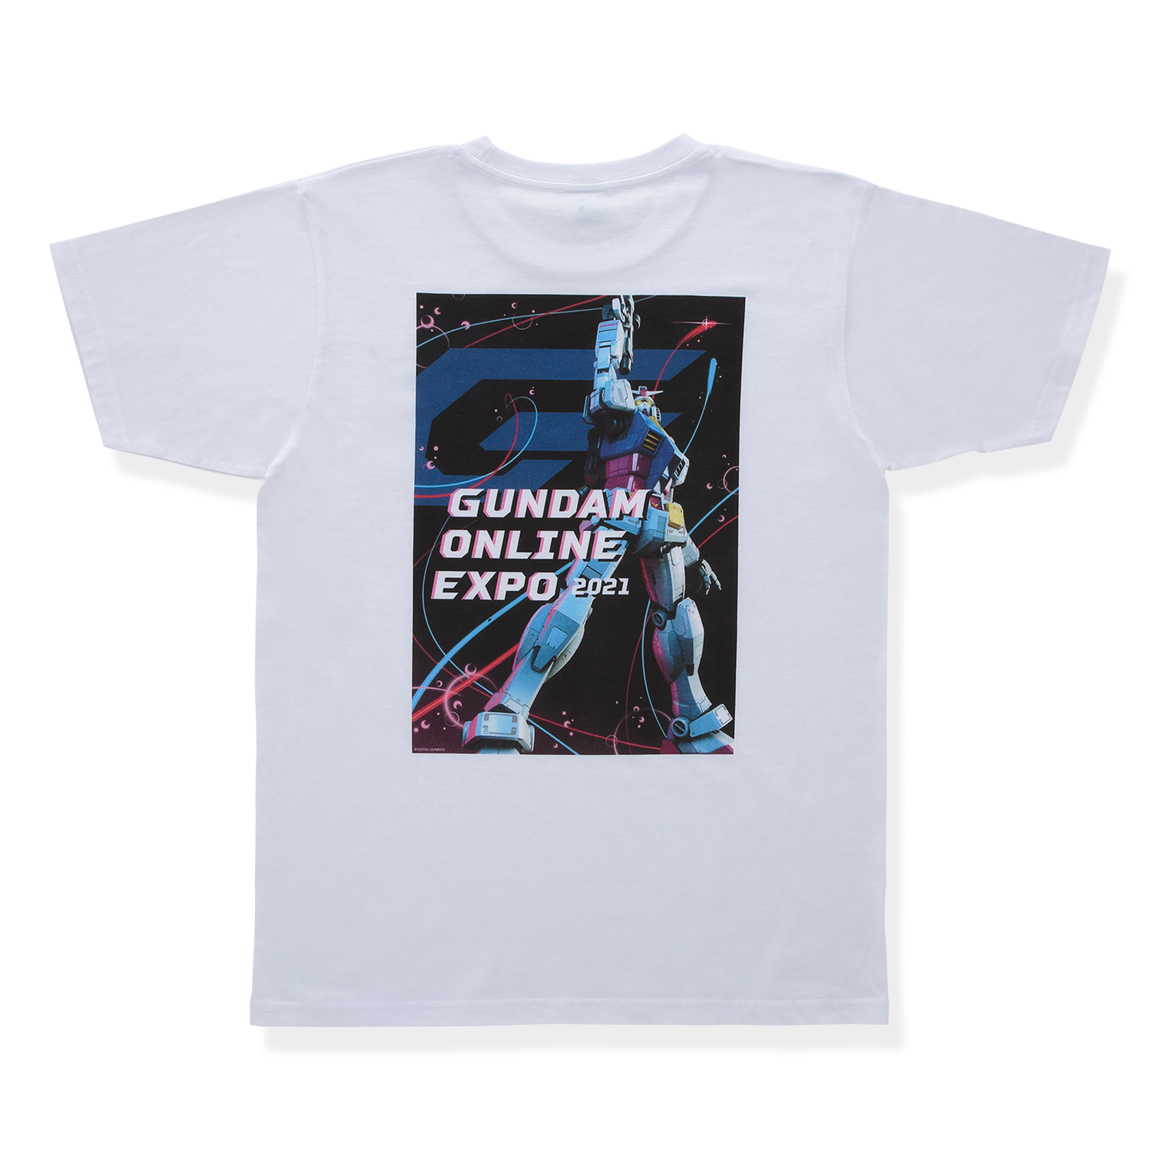 Gundam Online Expo Key Visual T-Shirt 2021 (White)